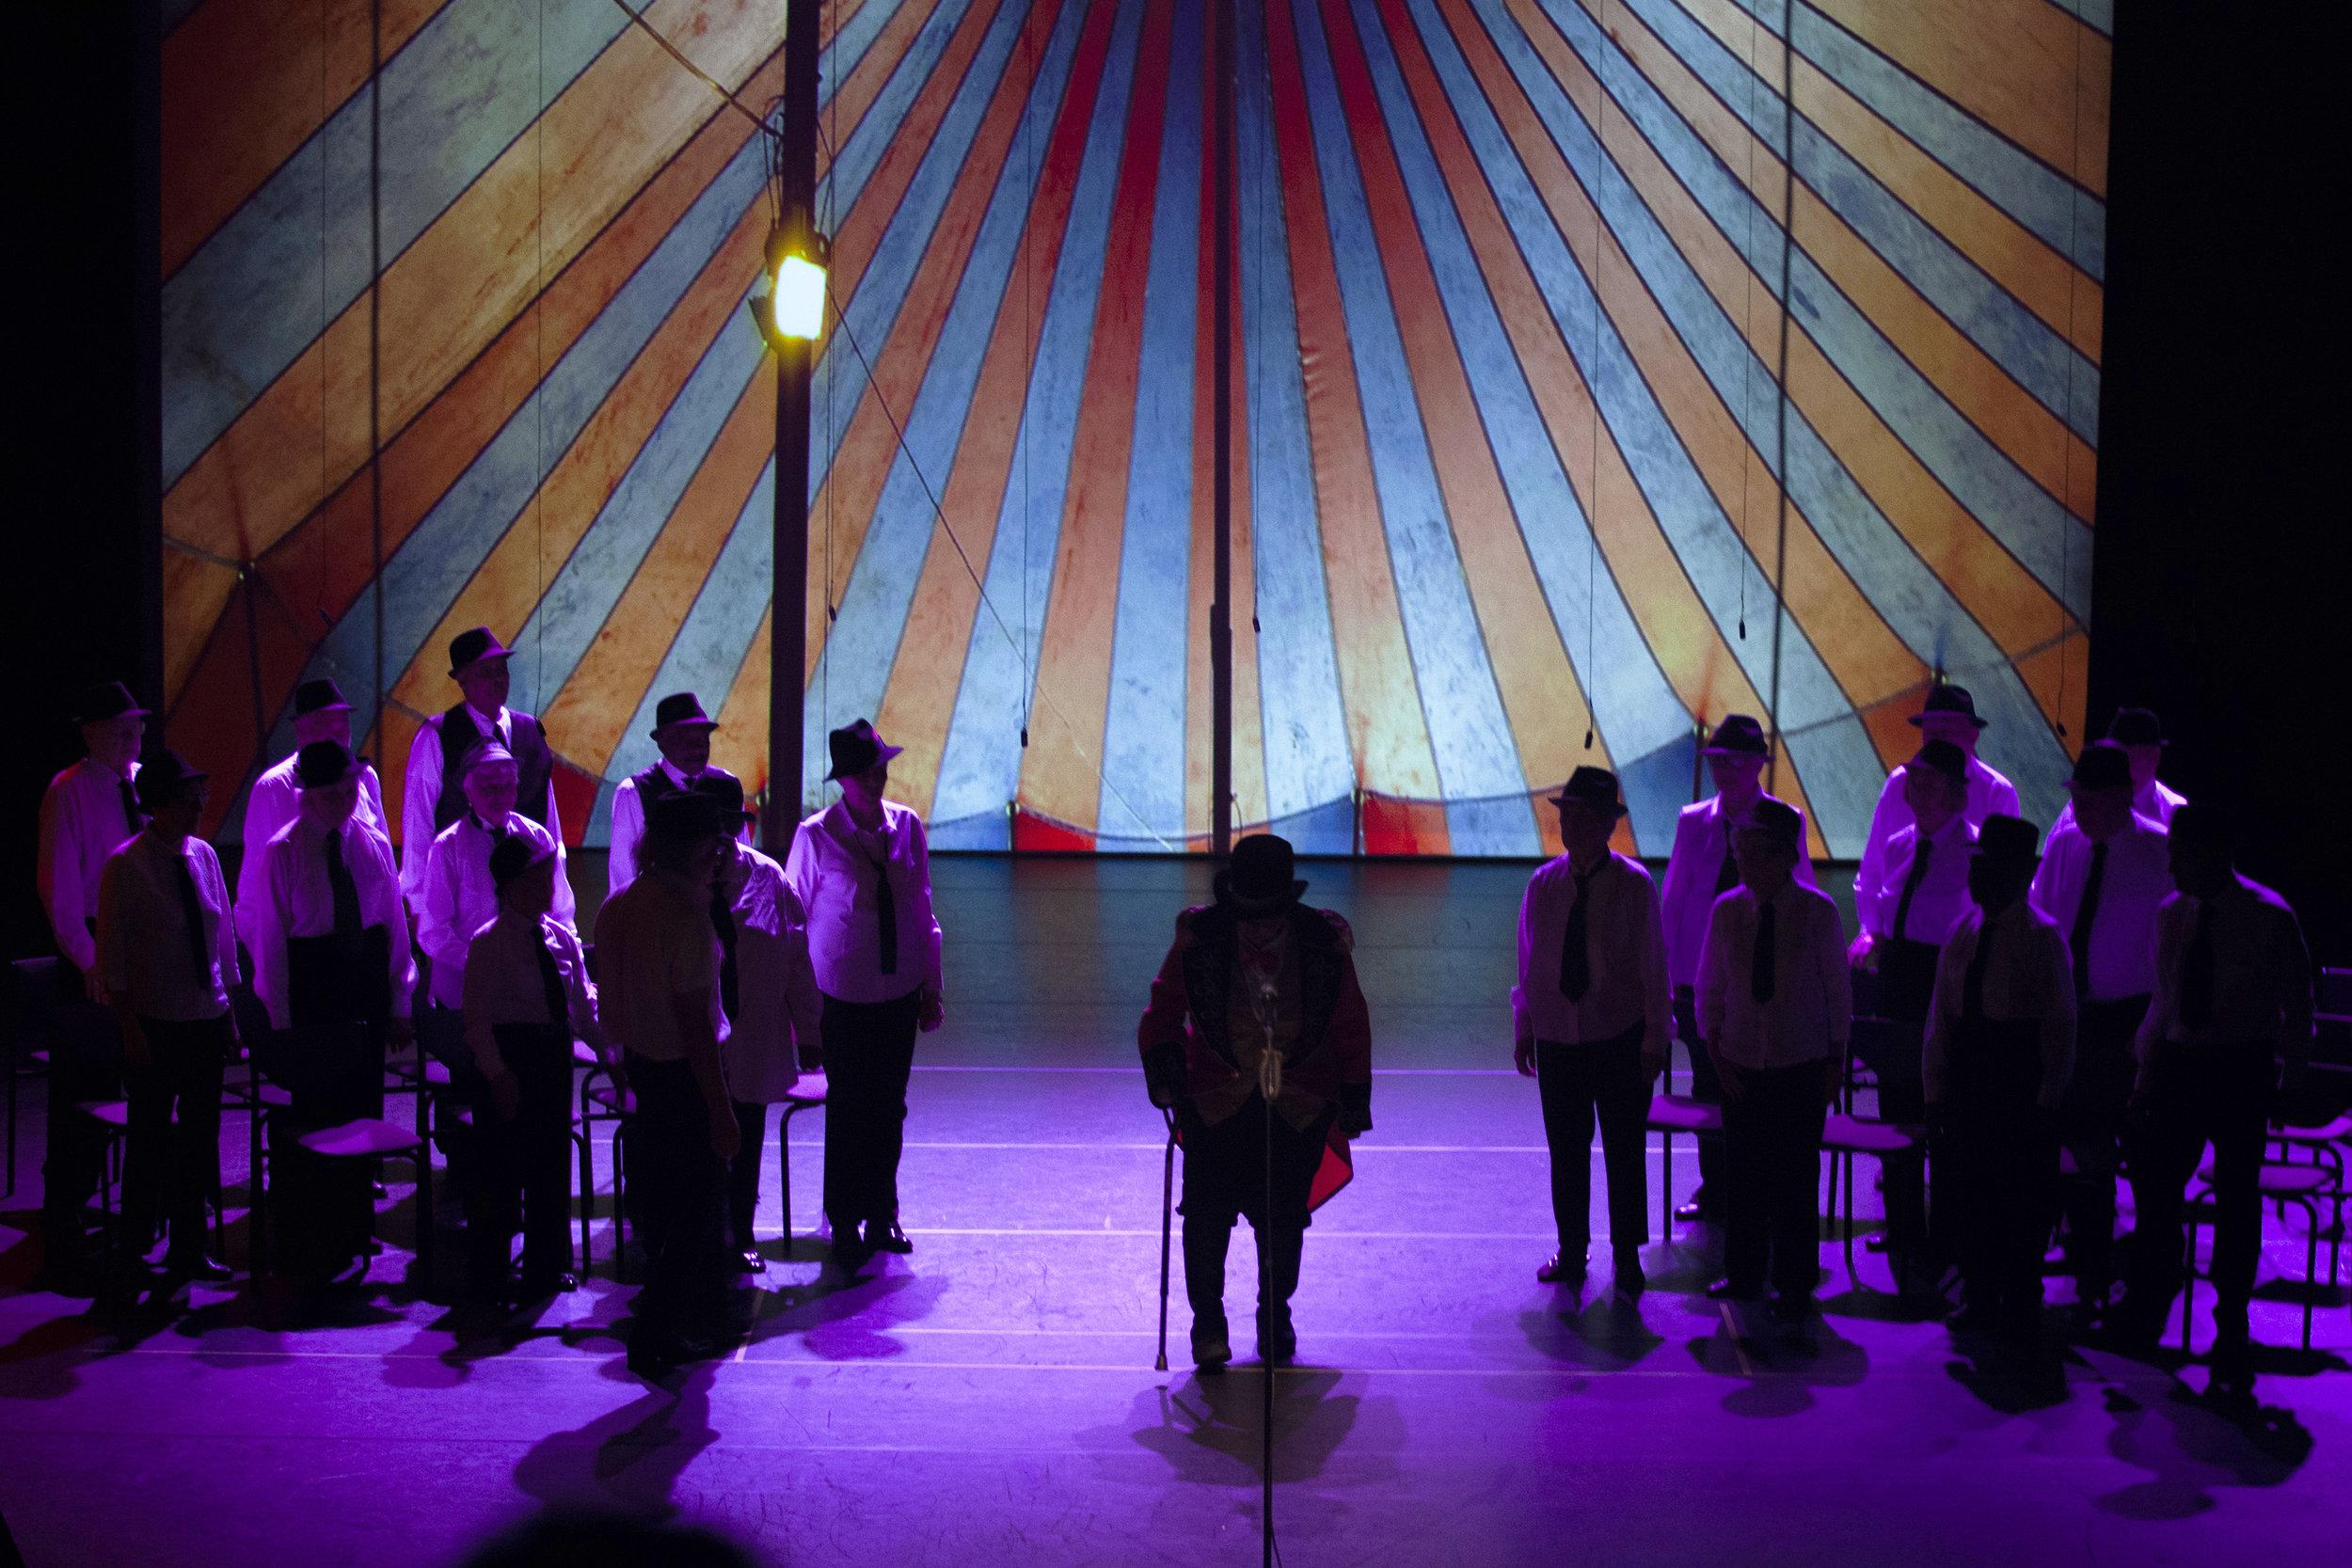 The Chorus under the big tent